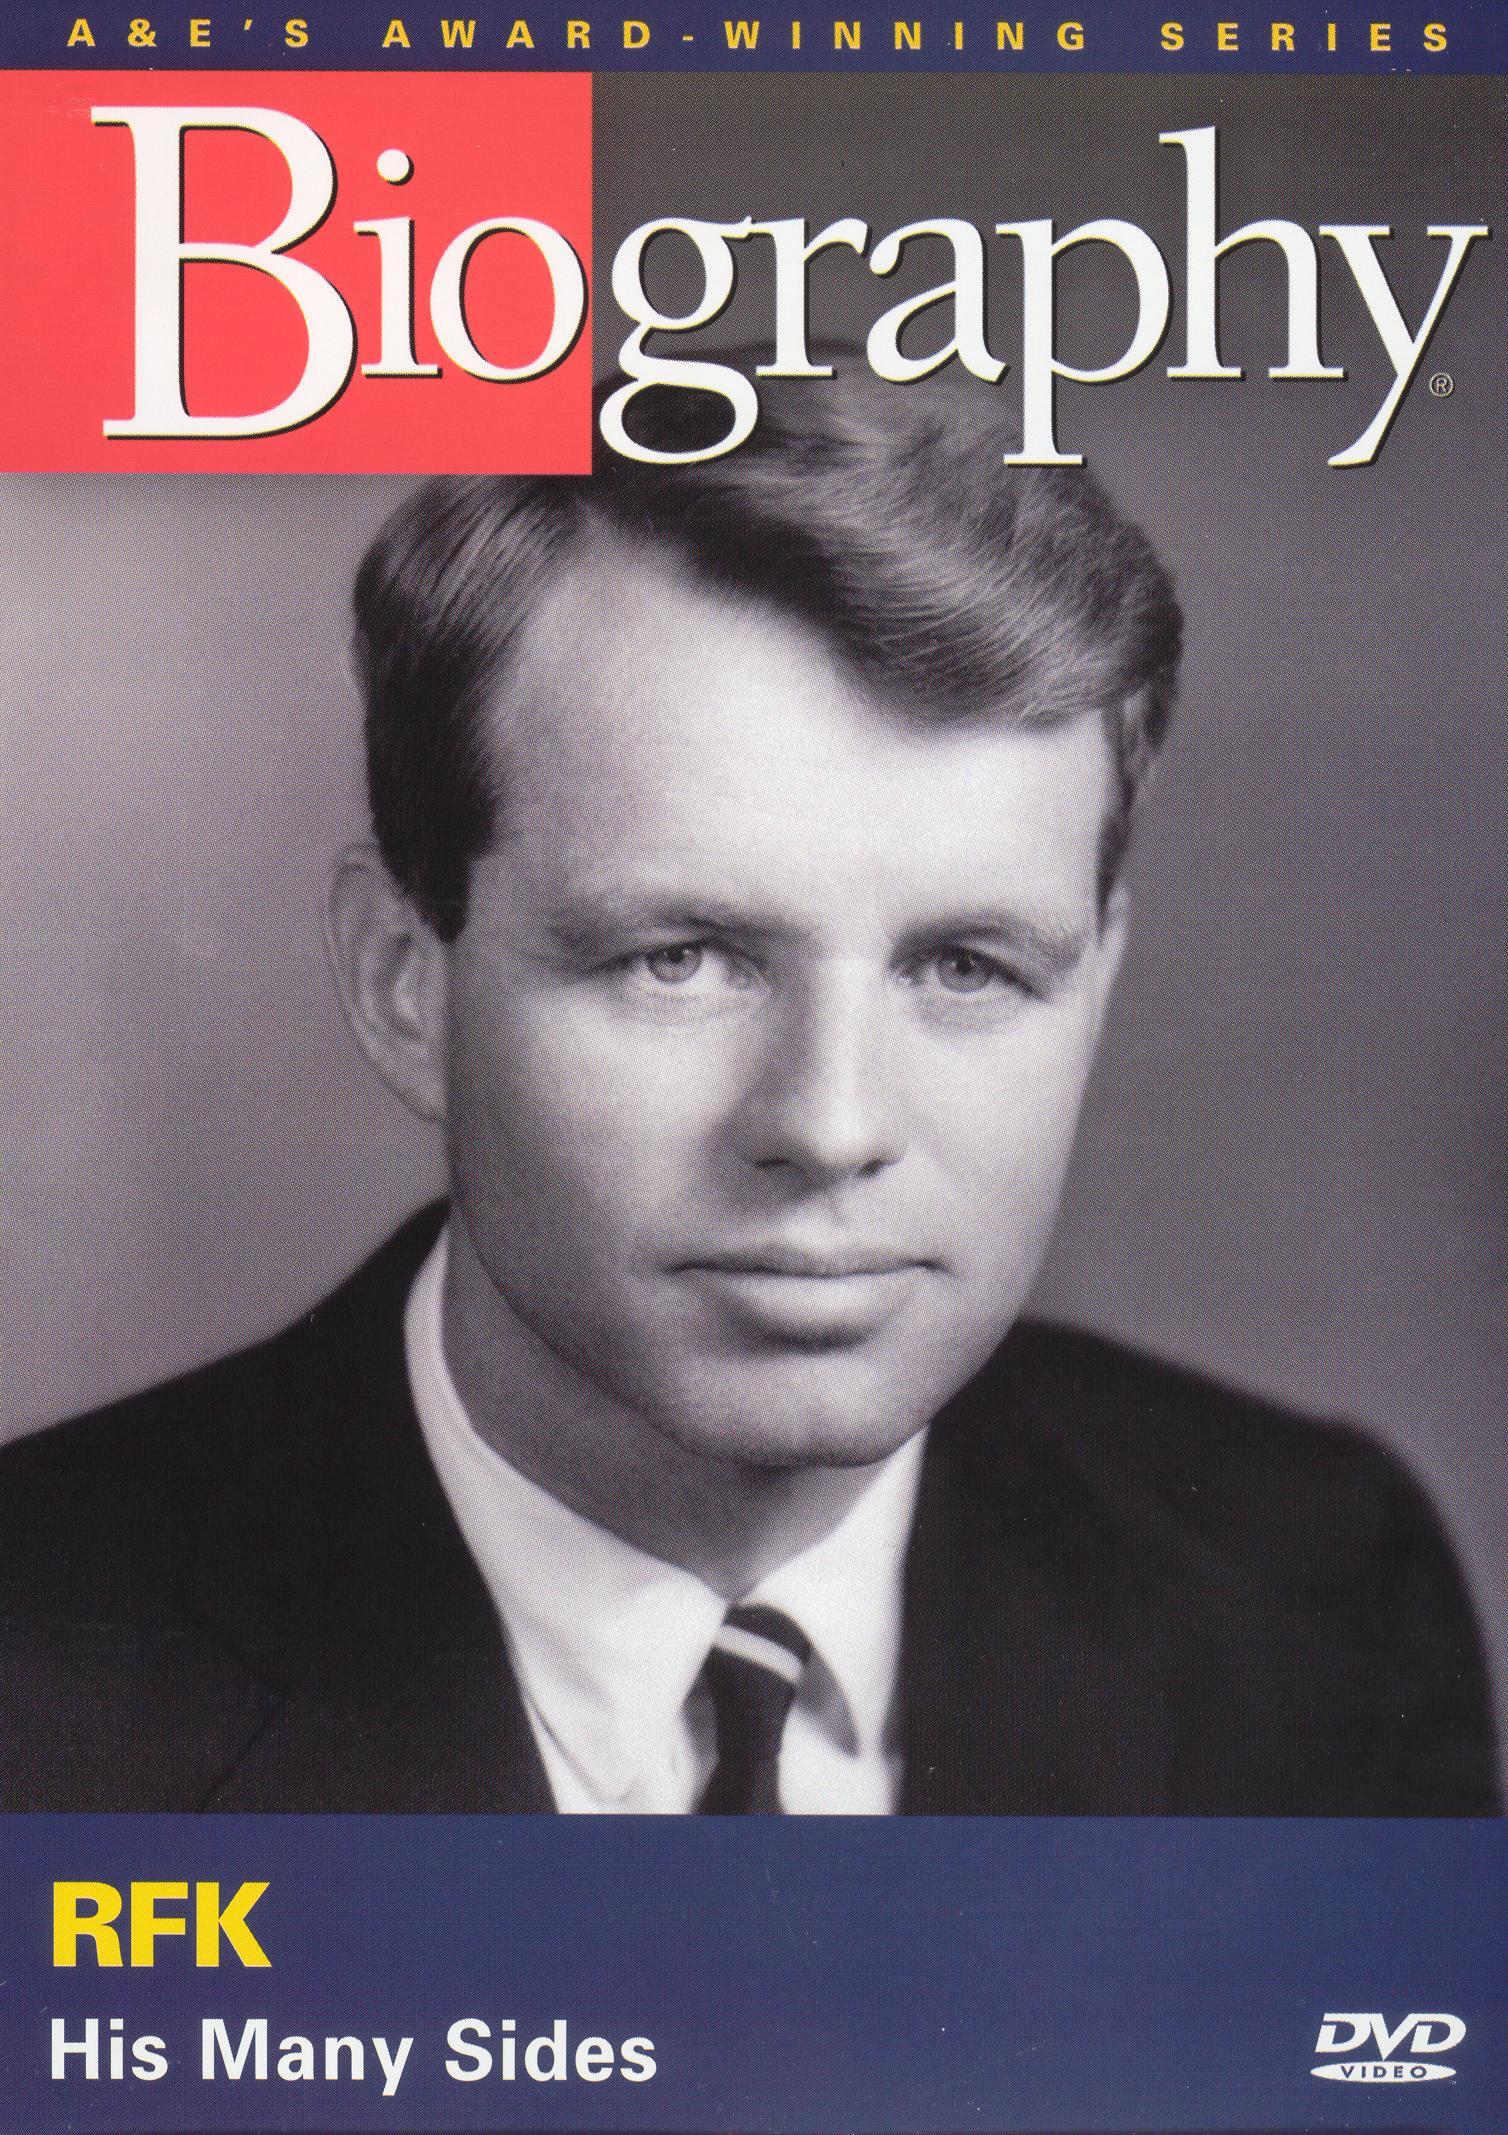 Biography: Robert F. Kennedy